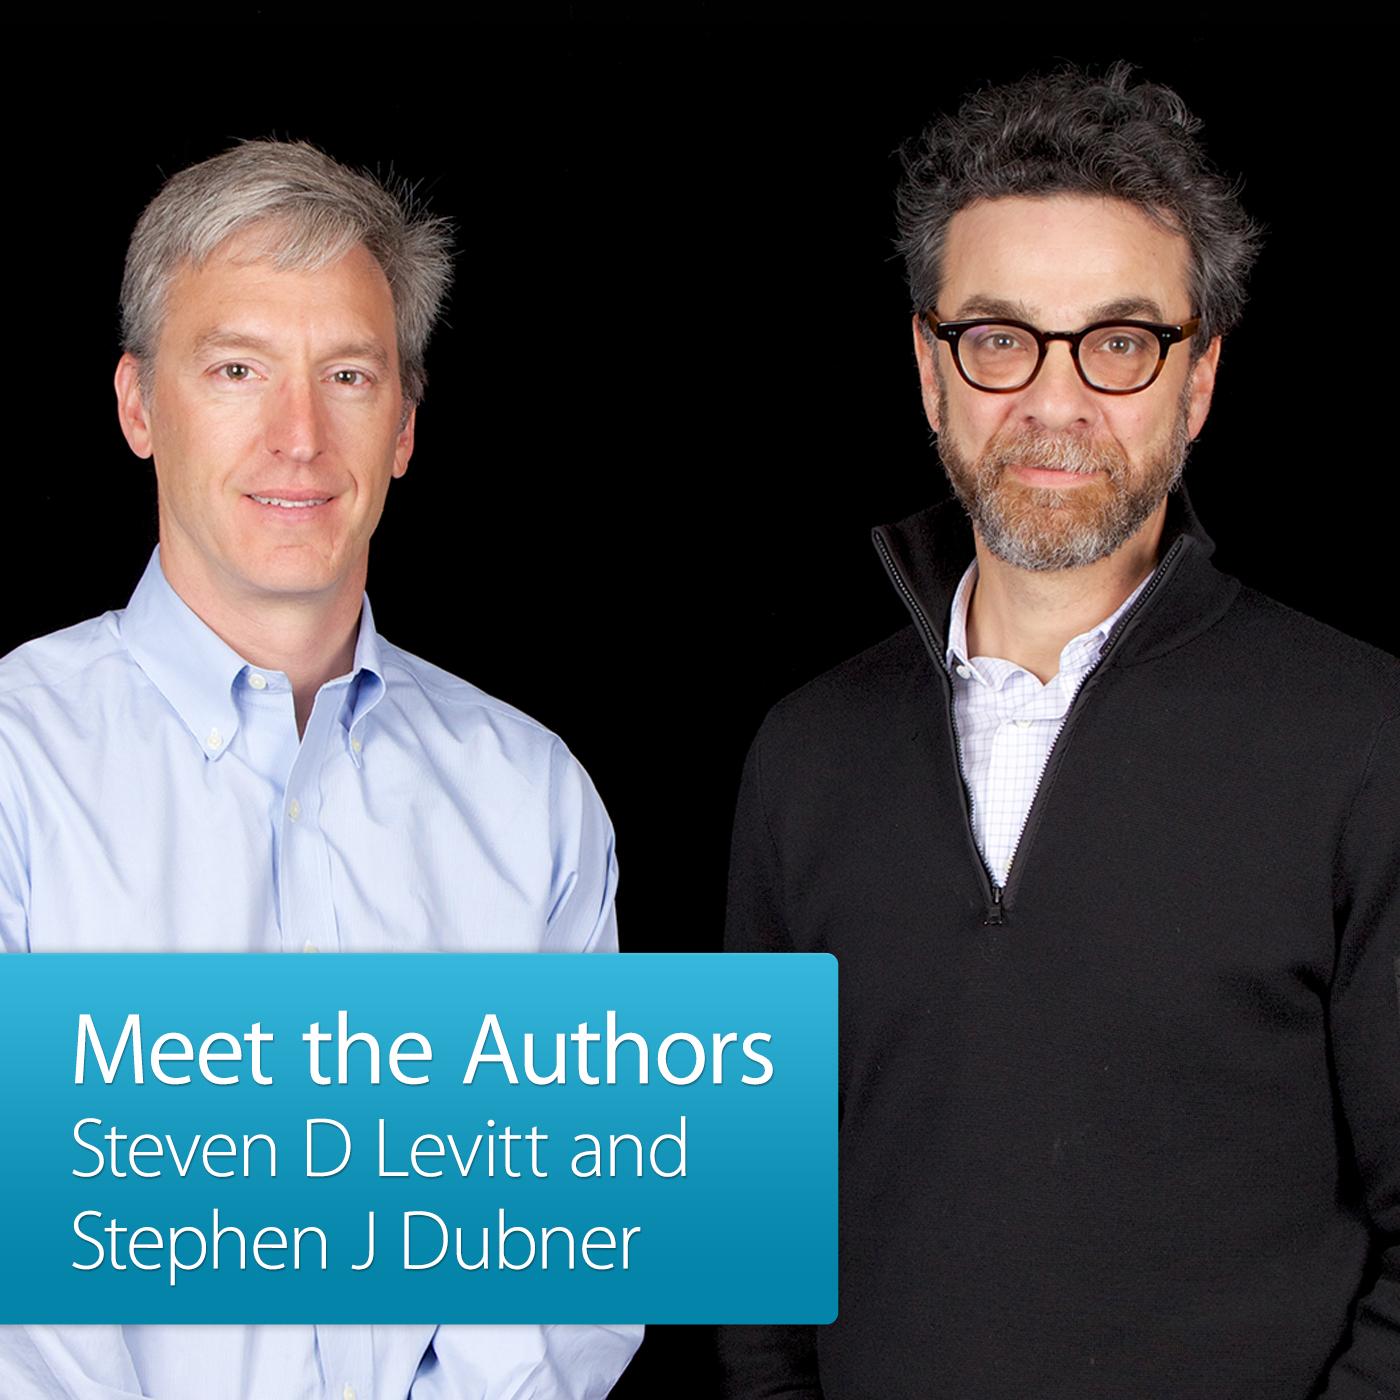 Steven D Levitt and Stephen J Dubner: Meet the Author